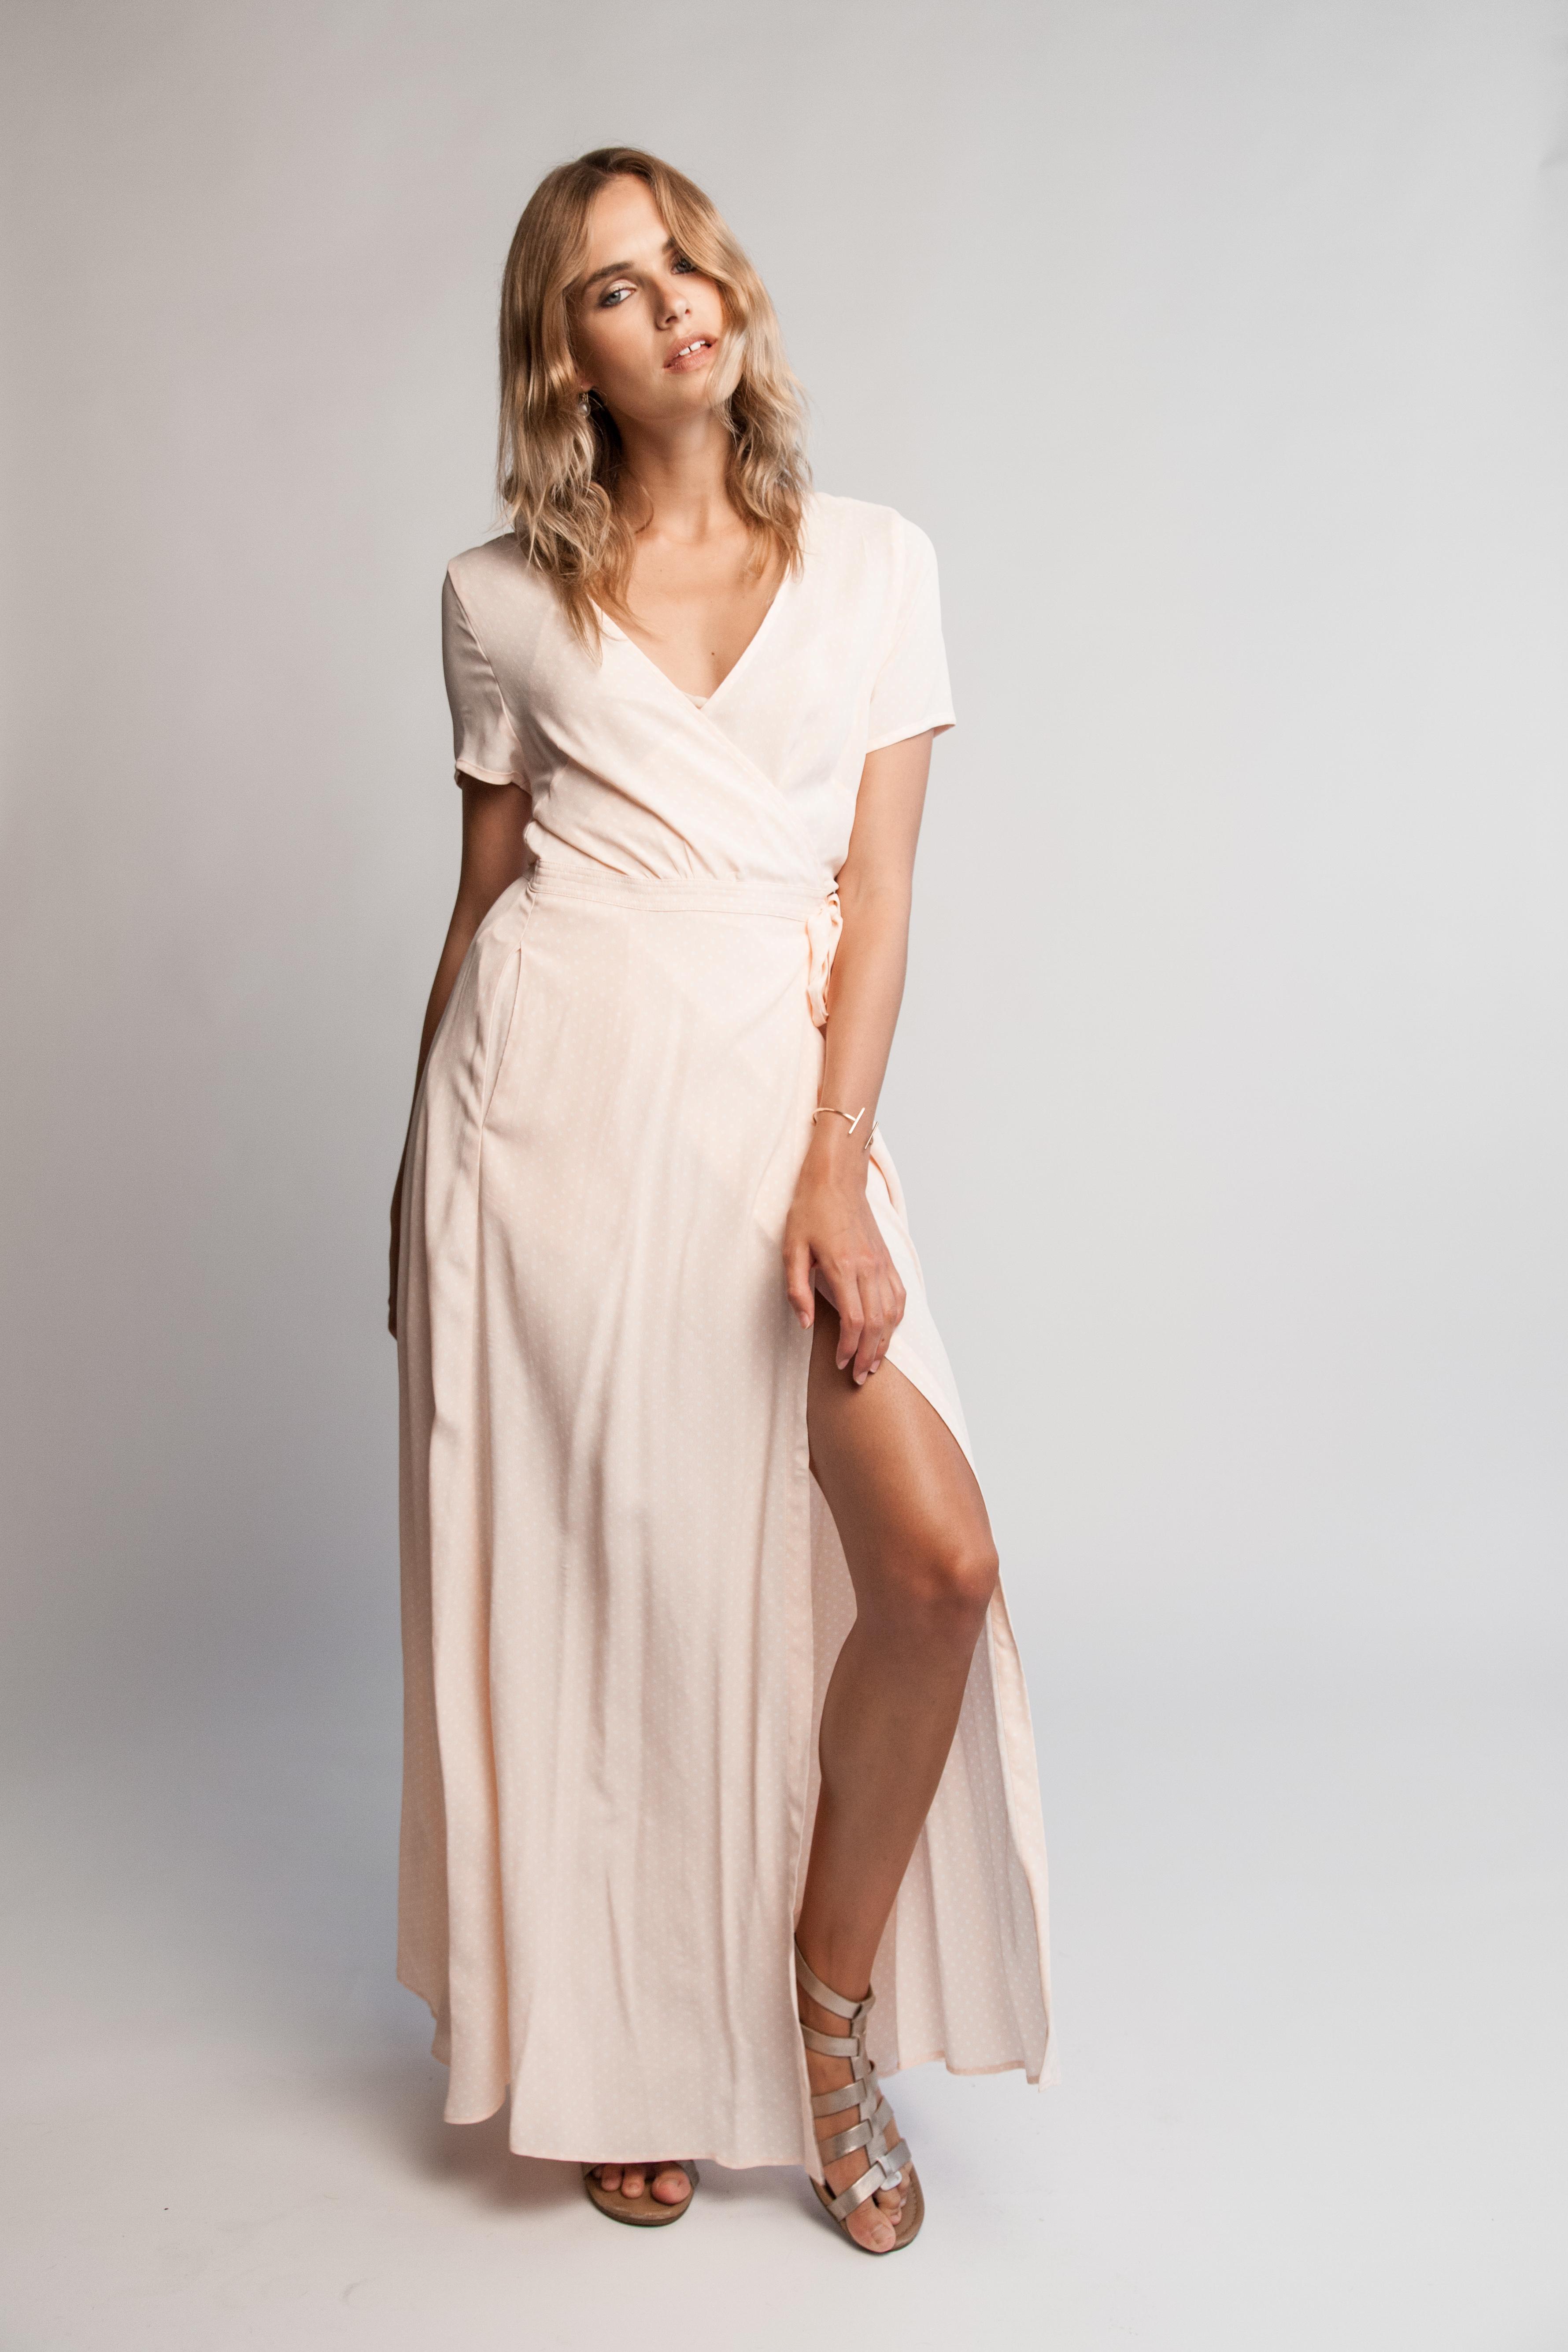 Charlotte Classic Wrap Dress Nudz Beachwear